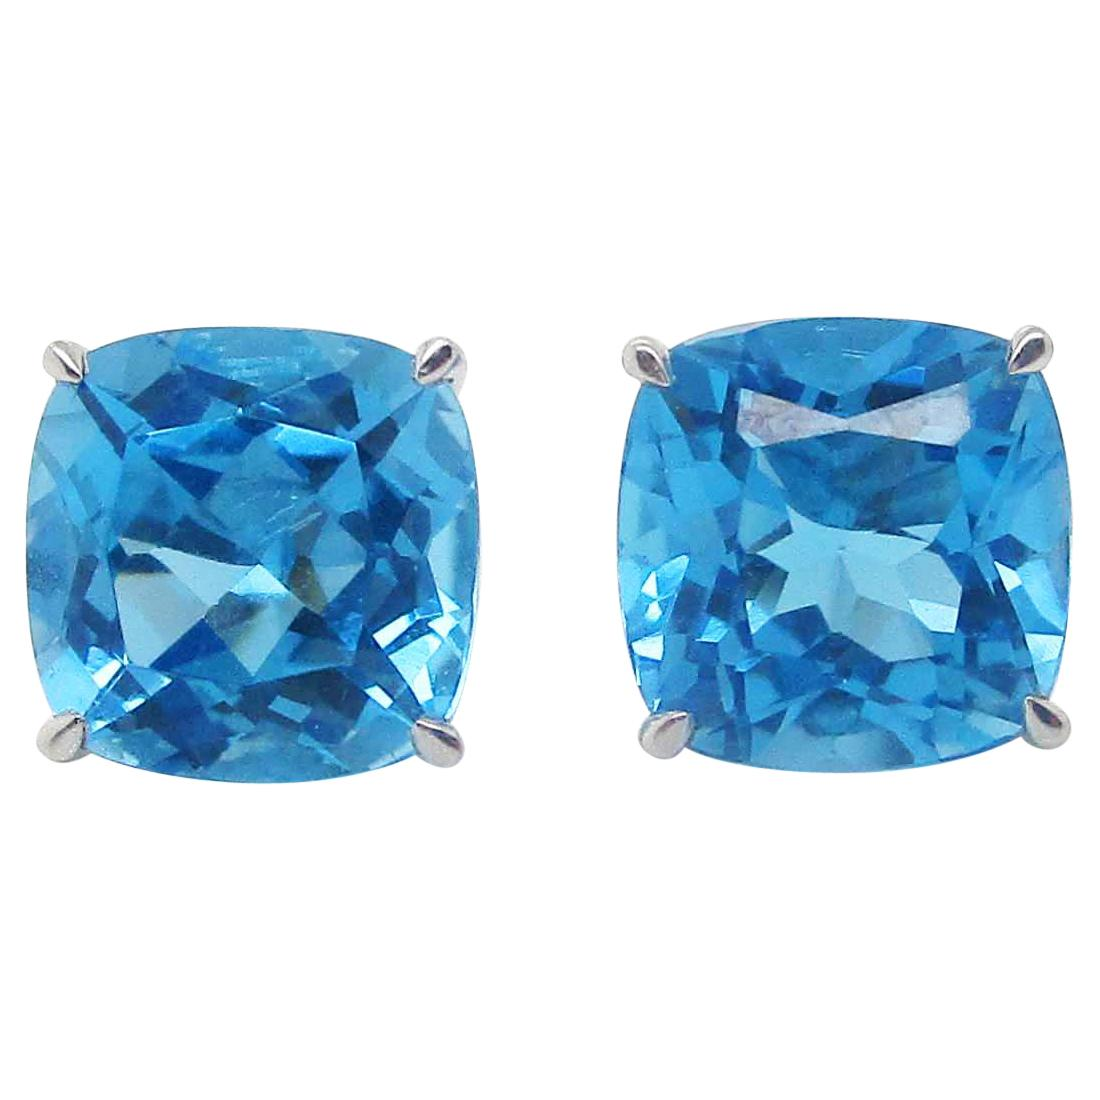 14 Karat White Gold Cushion Cut Blue Topaz Stud Earrings